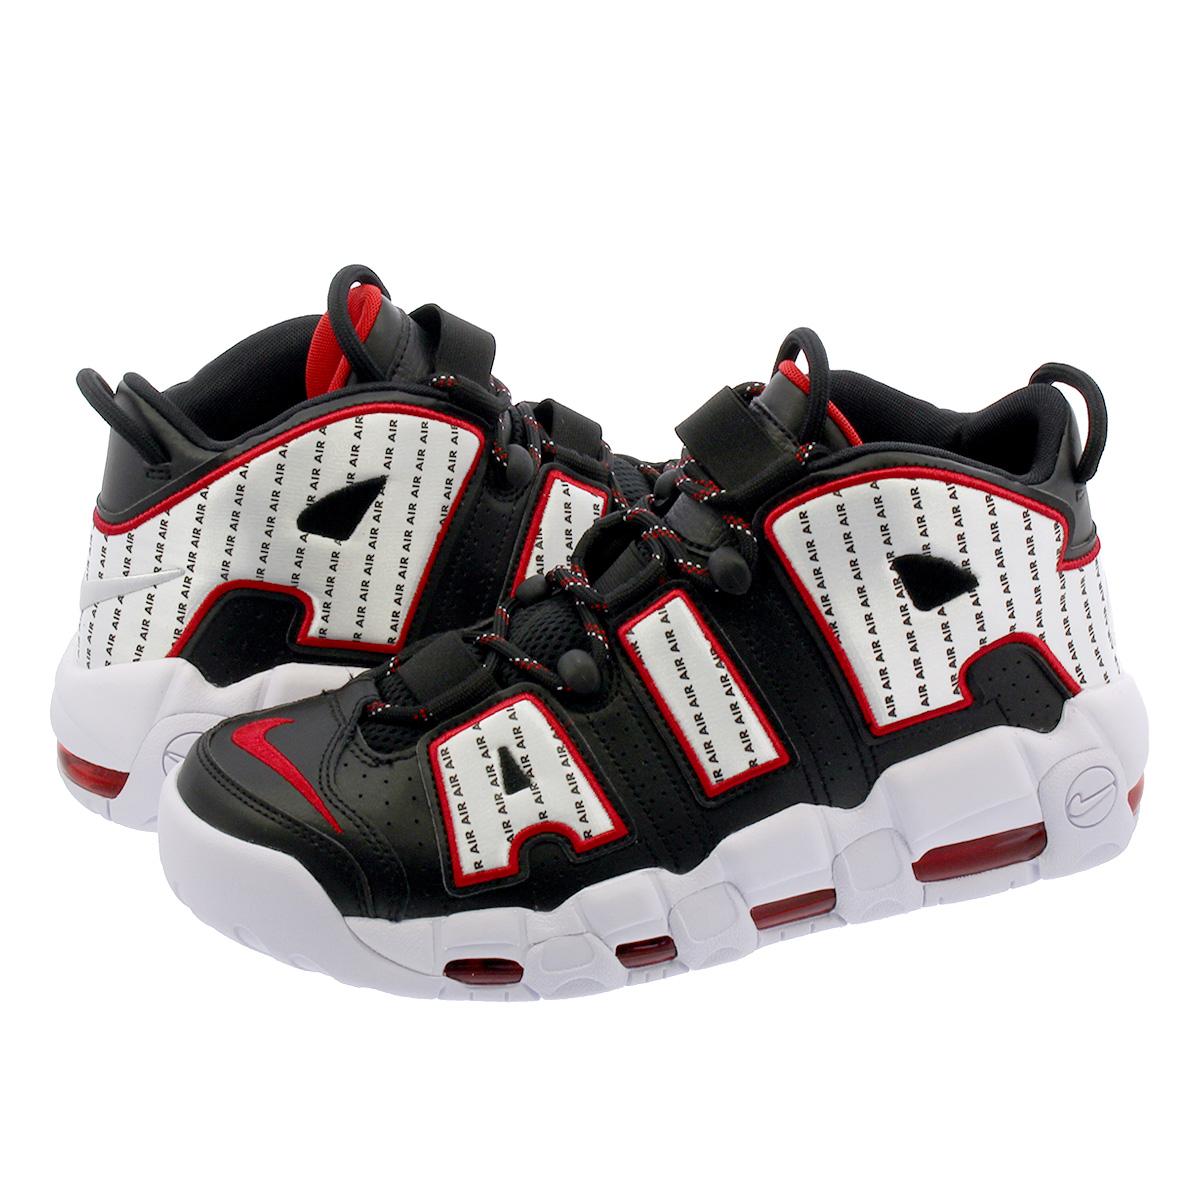 NIKE AIR MORE UPTEMPO 96 Nike air more up tempo 96 BLACK/WHITE/UNIVERSITY